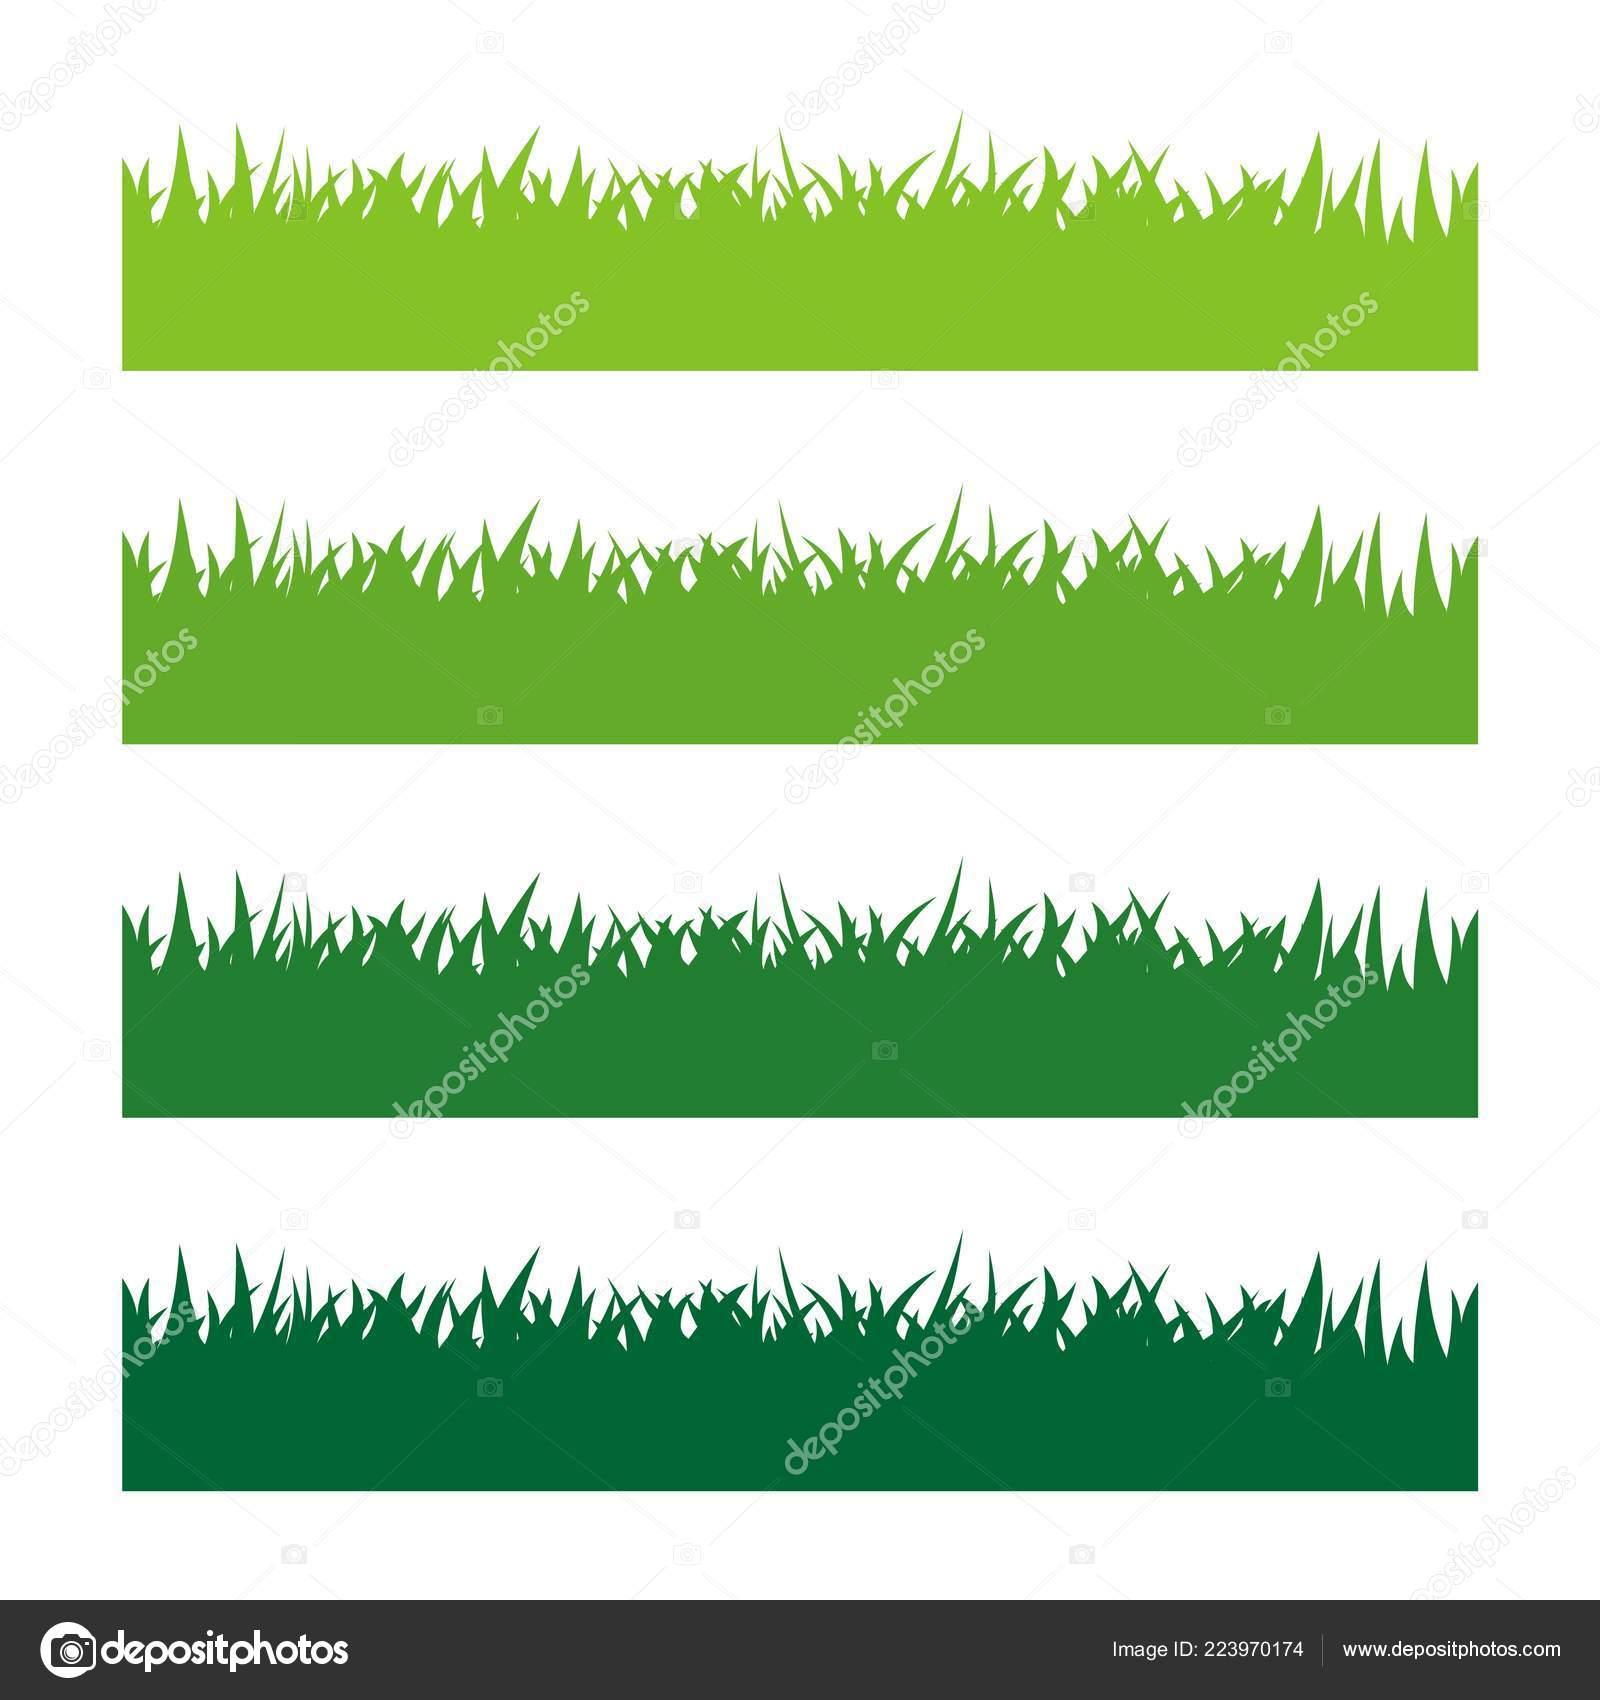 green grass set vector logo template stock vector c soponyono 223970174 green grass set vector logo template stock vector c soponyono 223970174